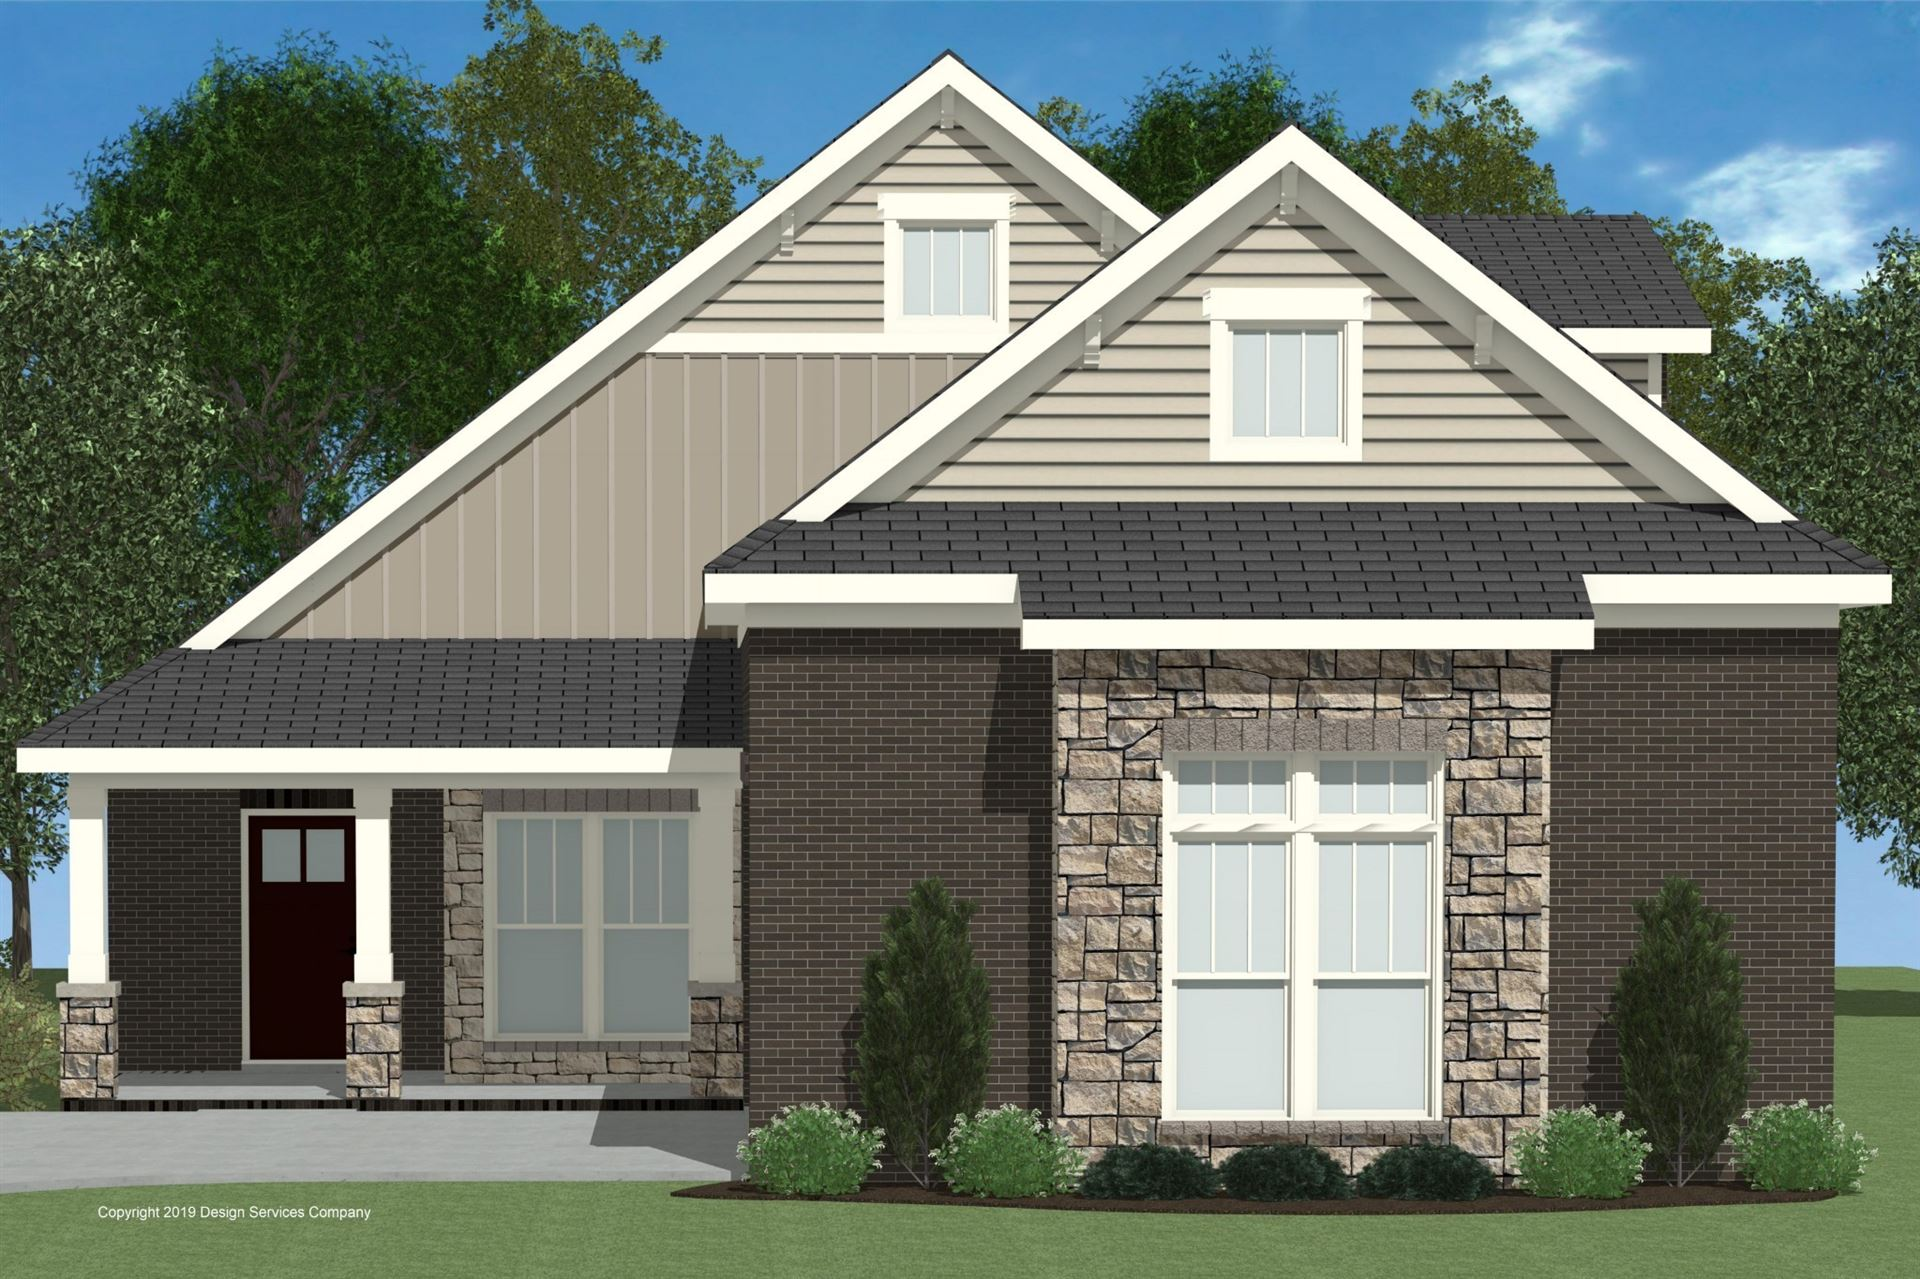 Photo of 6561 Frye Lane, Hermitage, TN 37076 (MLS # 2290999)